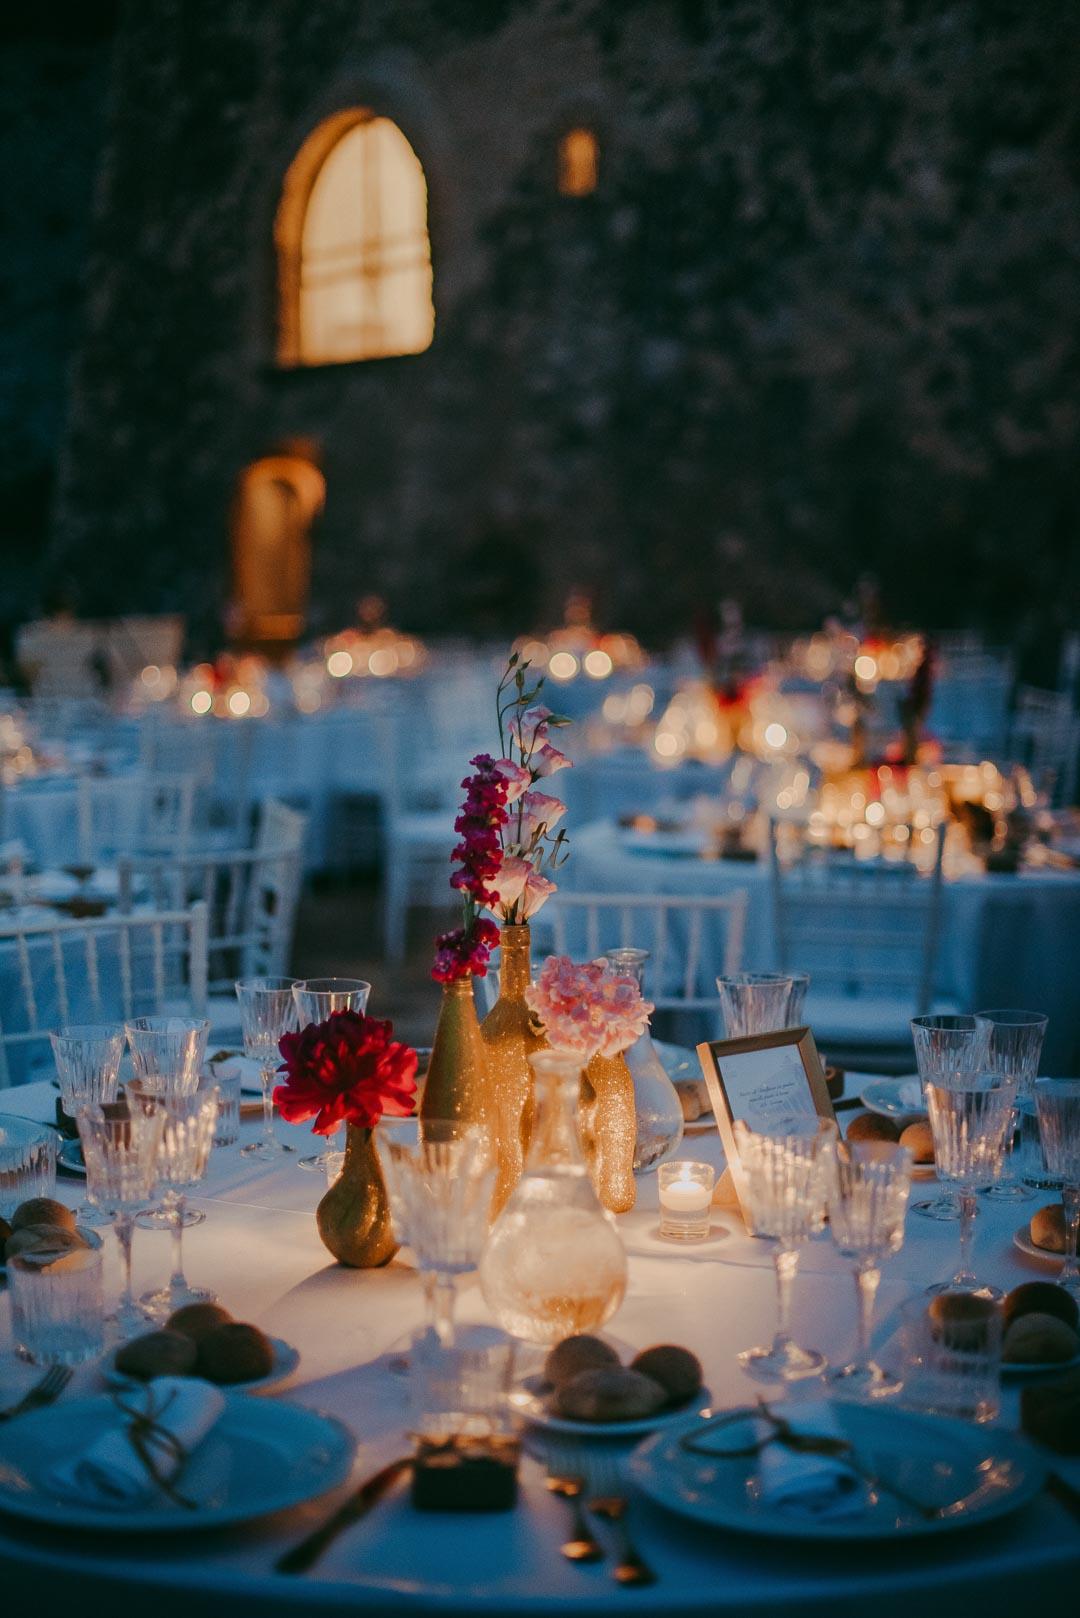 wedding-photographer-destination-fineart-bespoke-reportage-amalficoast-torrelacerniola-vivianeizzo-spazio46-91